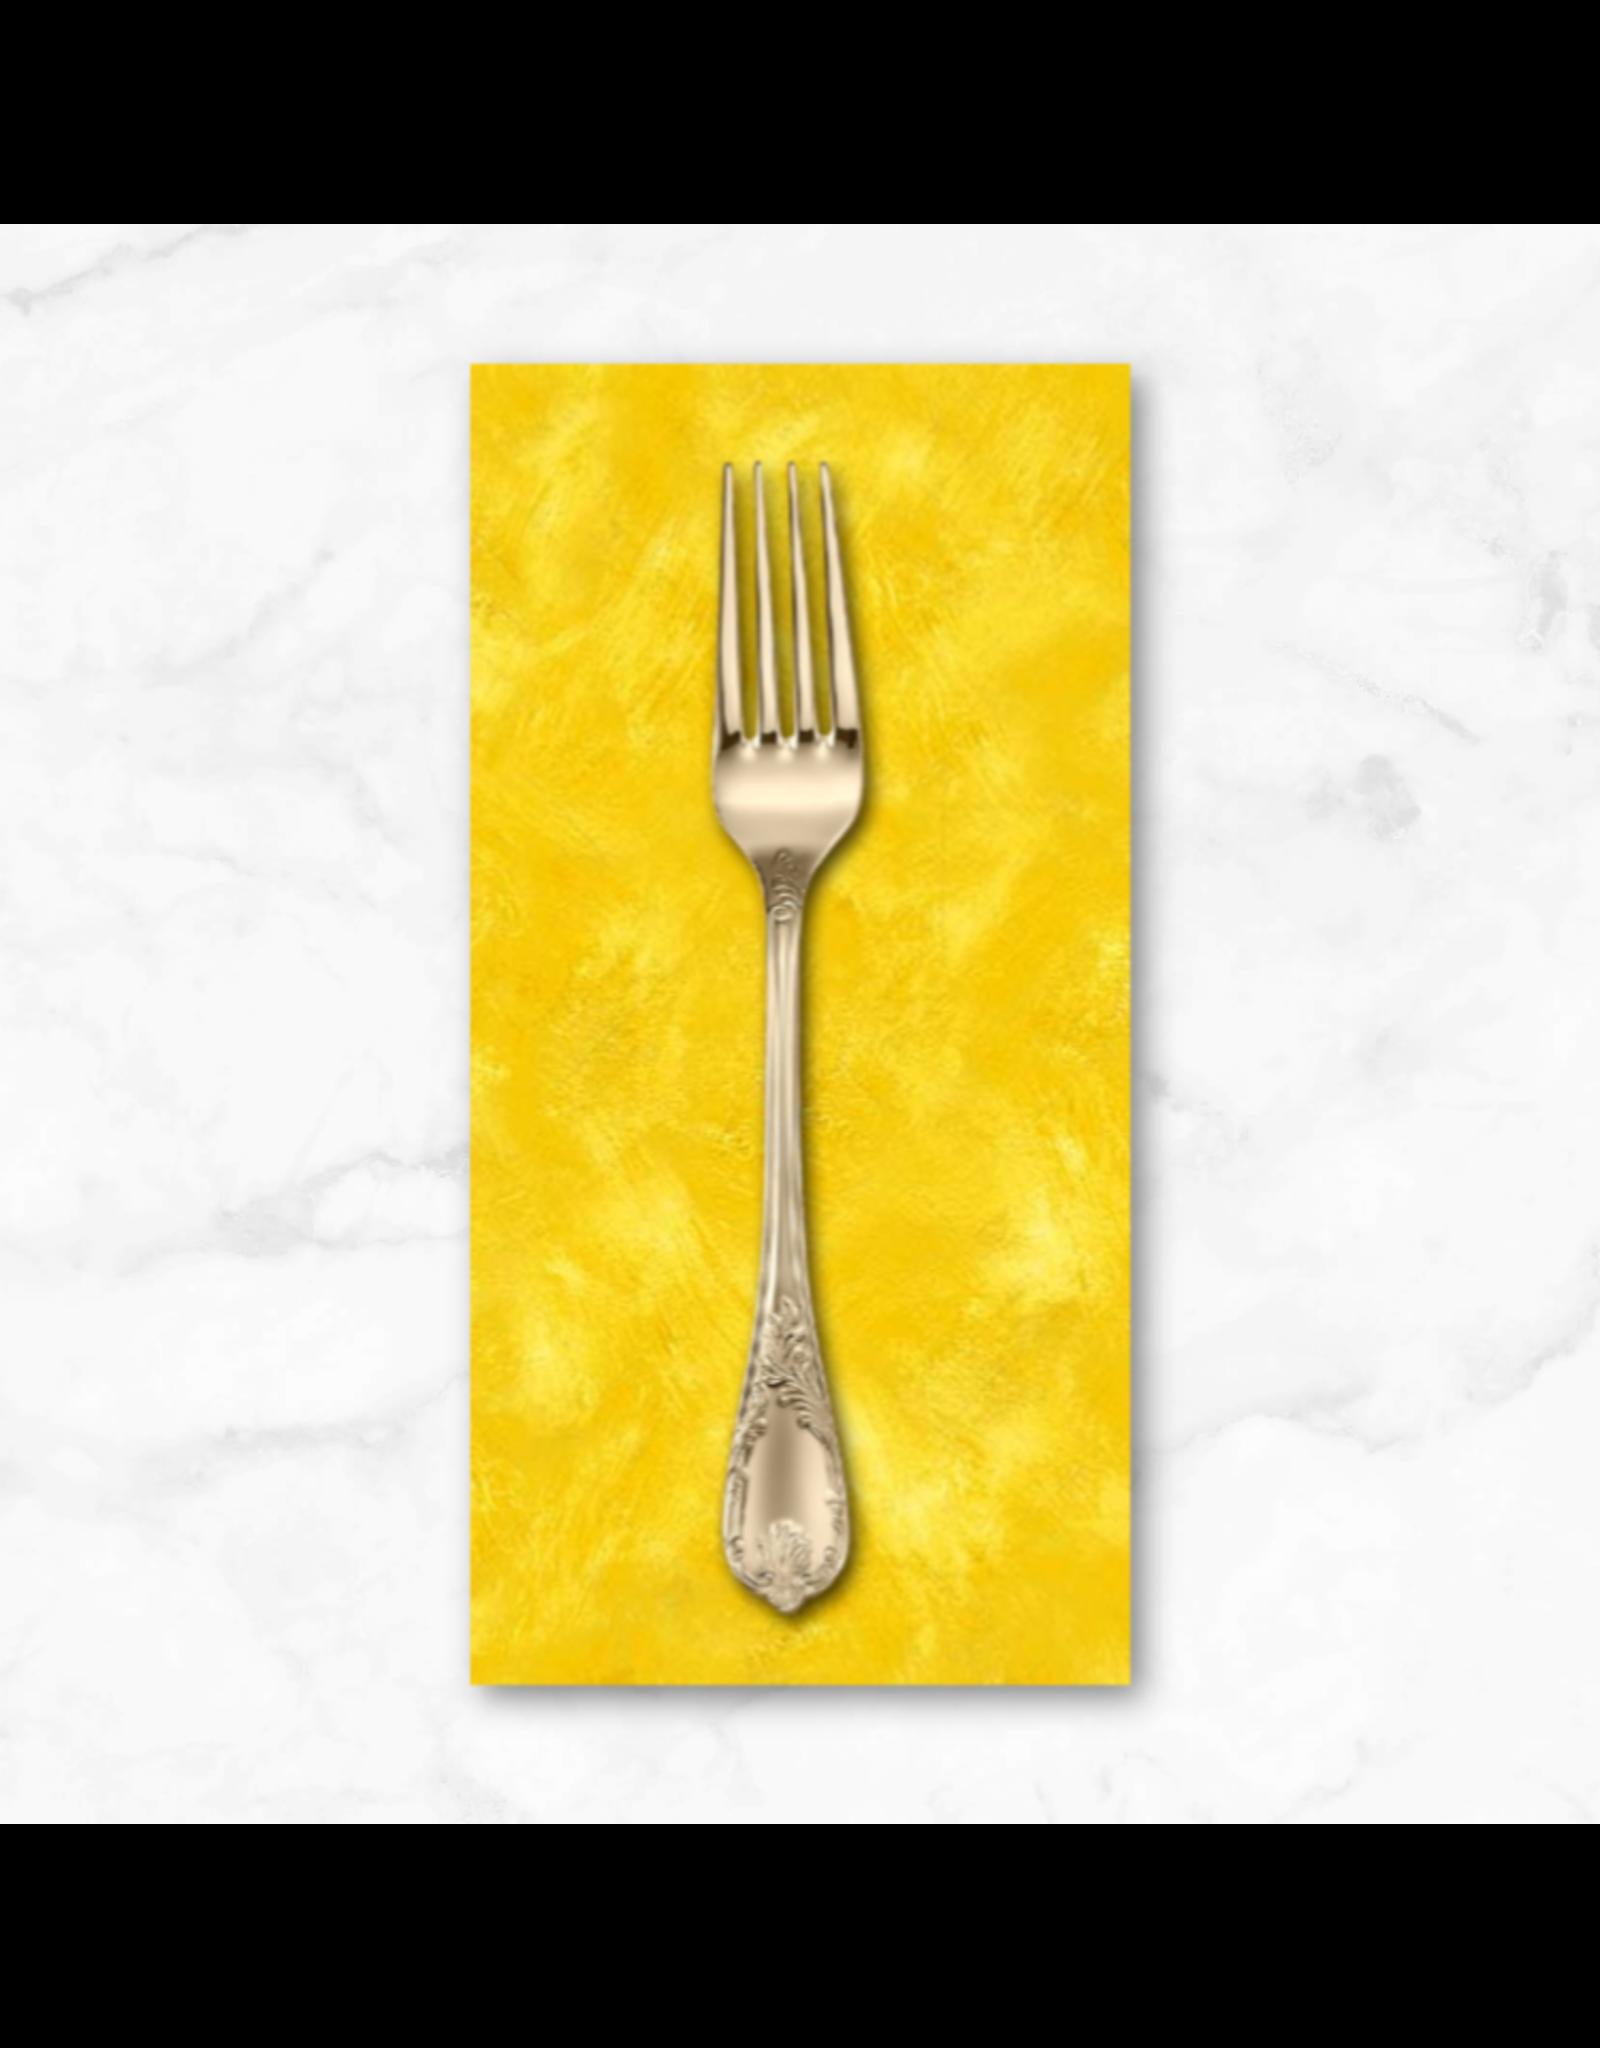 PD's Michael Miller Collection Eat, Sleep, Garden, Hand Sprayed in Yellow, Dinner Napkin